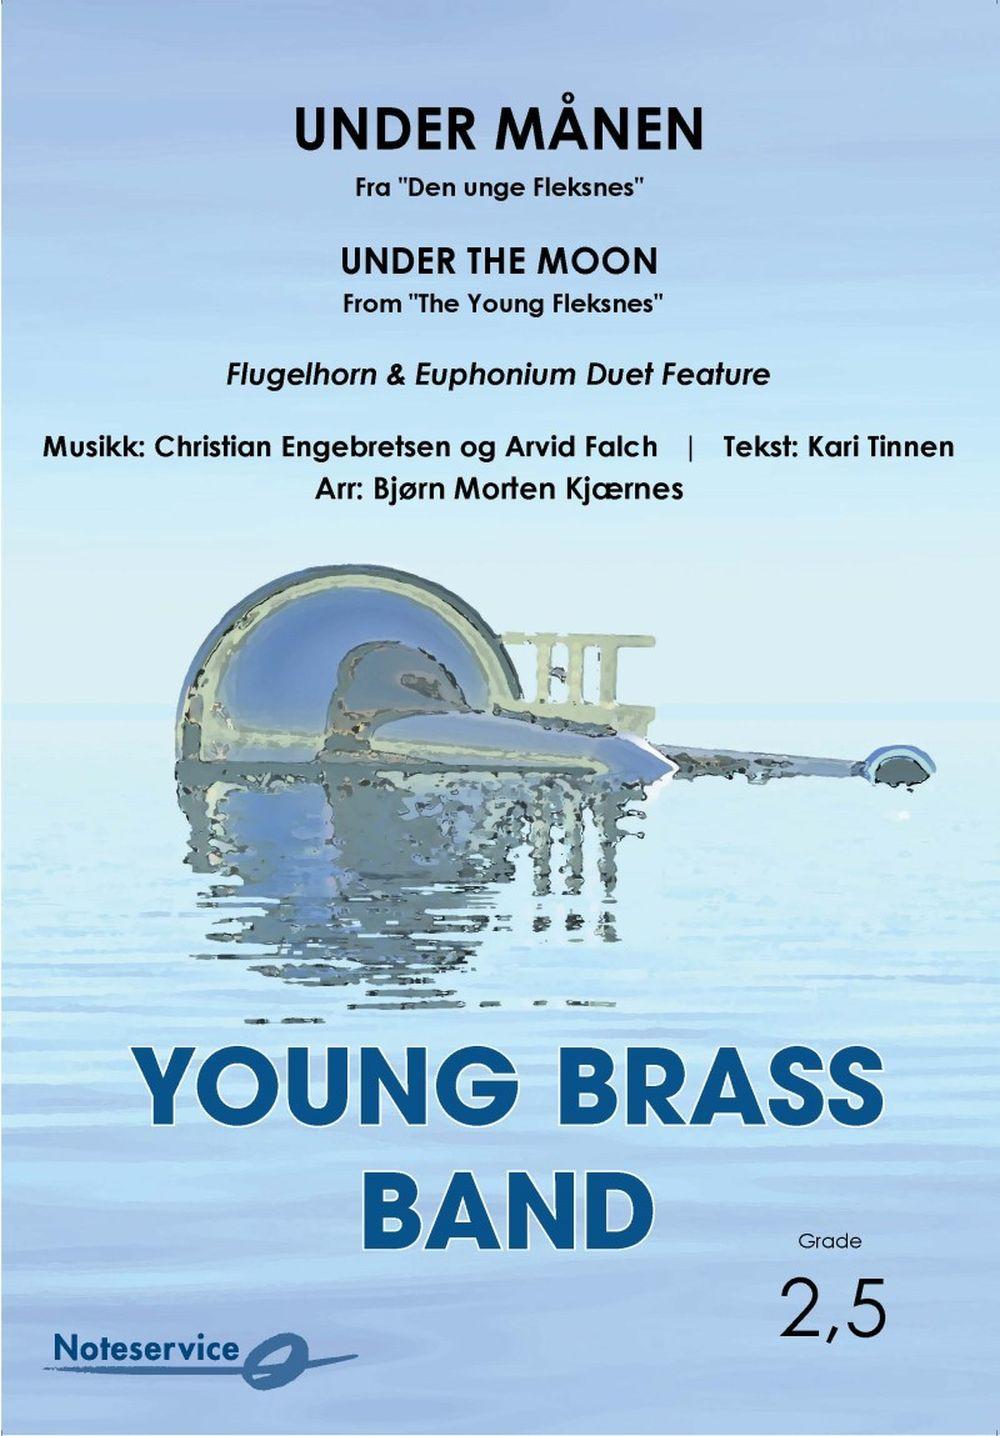 Christian Engebretsen Arvid Falch Kari Tinnen: Under månen (Fra Den unge